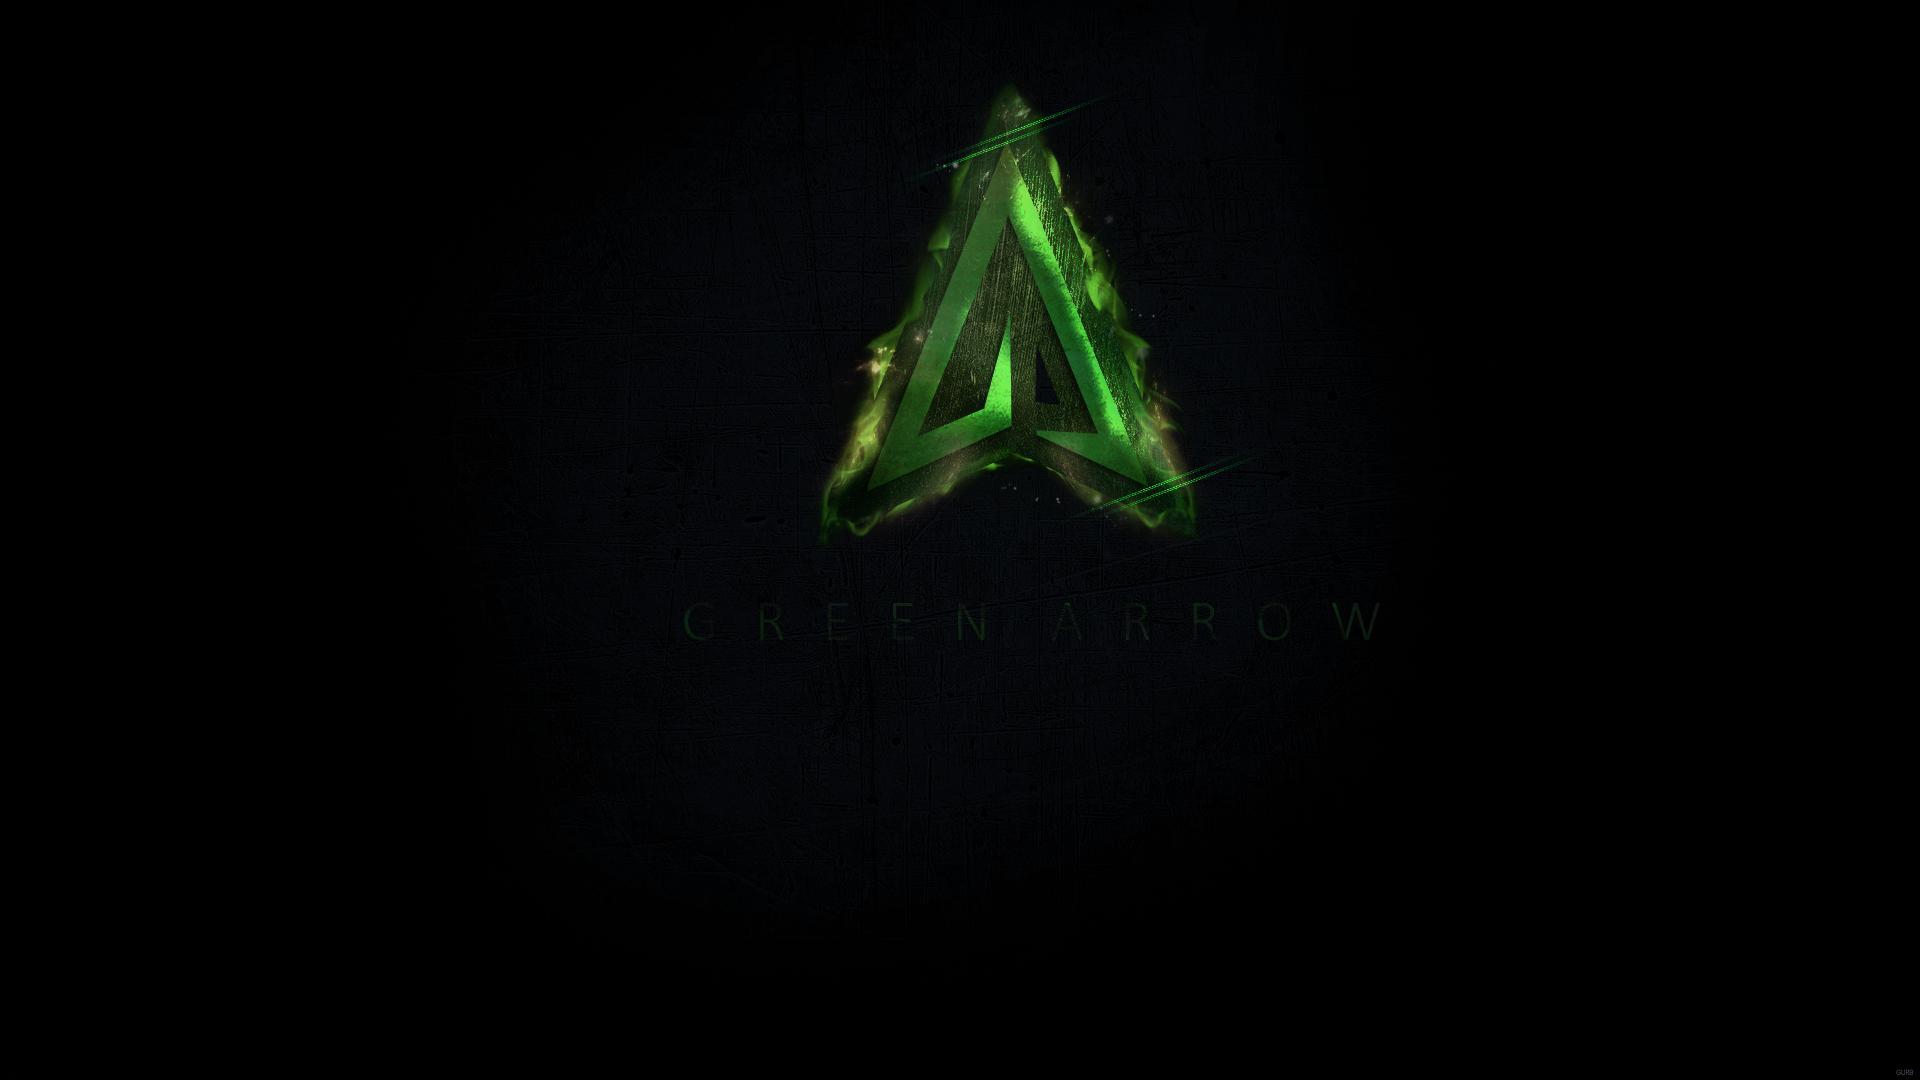 Green Arrow CW Wallpaper - WallpaperSafari